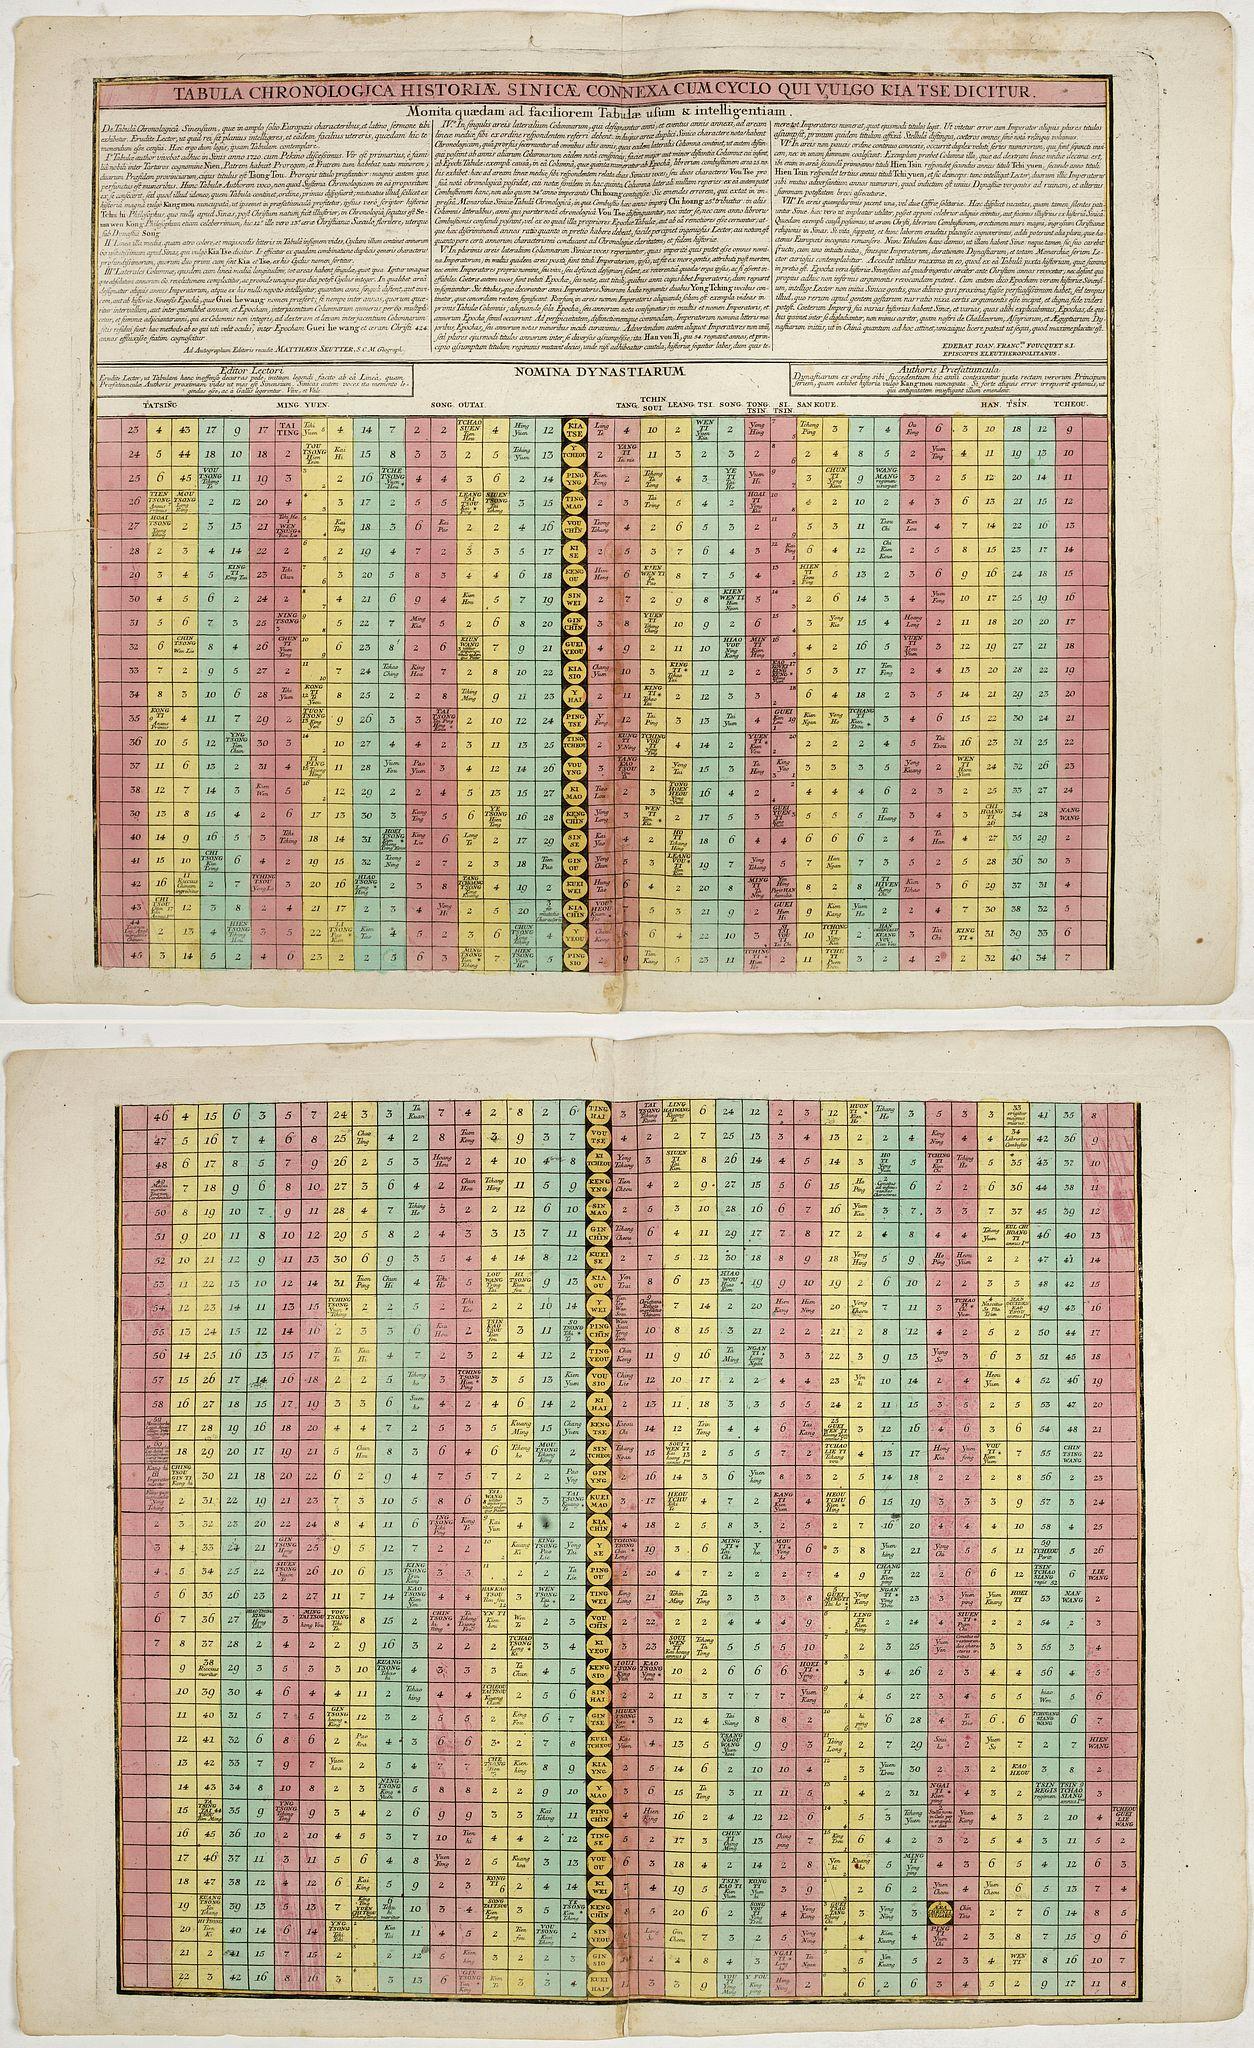 SEUTTER, M. / FOUQUET, J.F. -  Tabula chronologica historiae Sinicae connexa cum cyclo qui vulgo Kia Tse dictur.